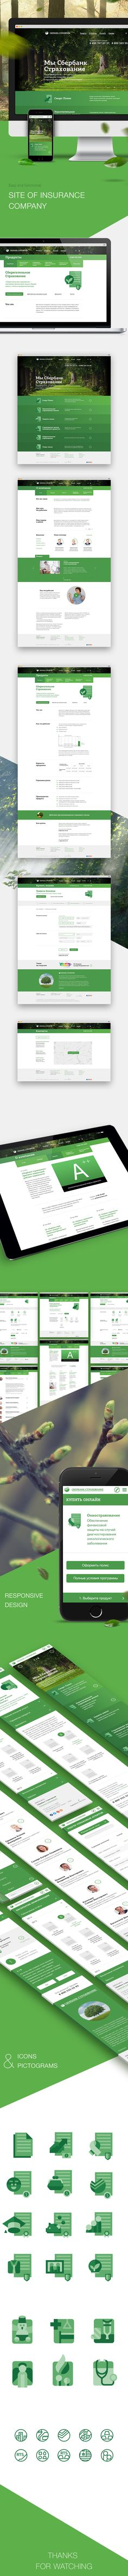 Sberbank insurance on Web Design Served